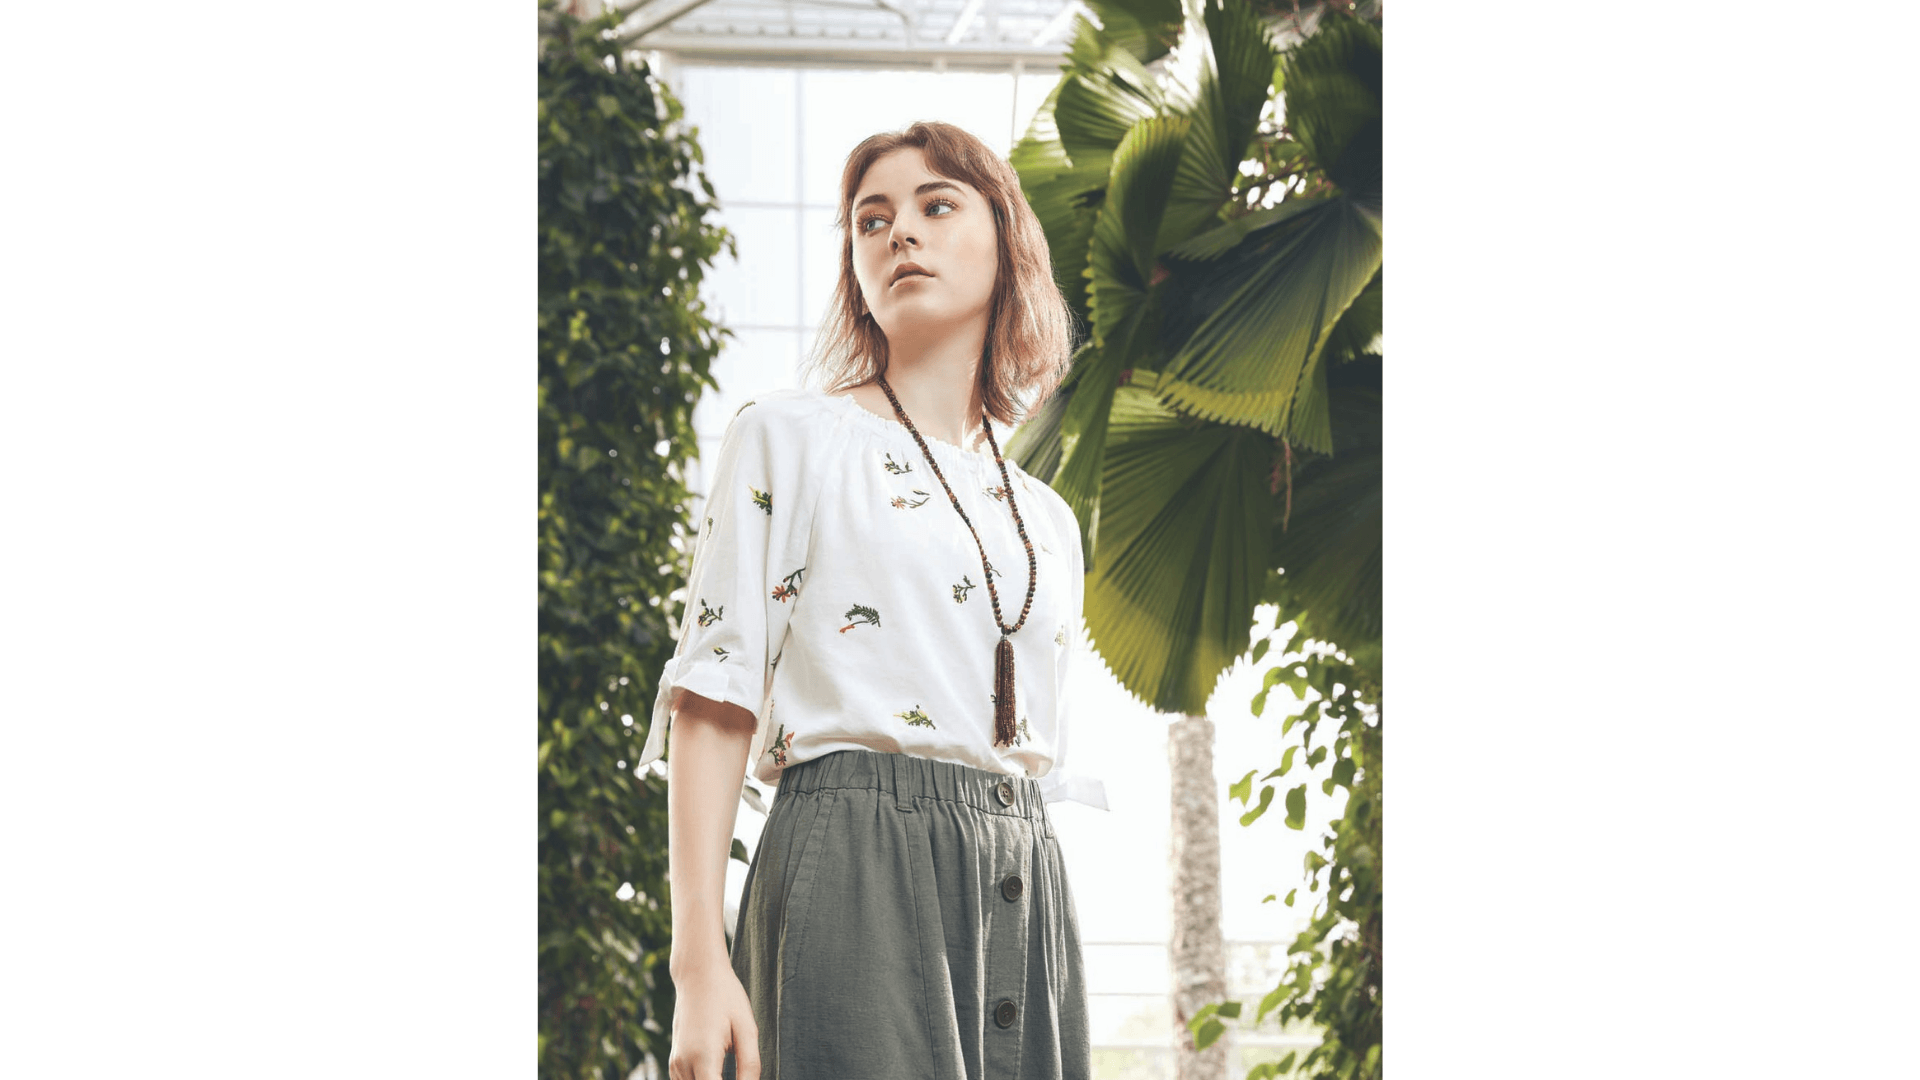 French Linen Website 7